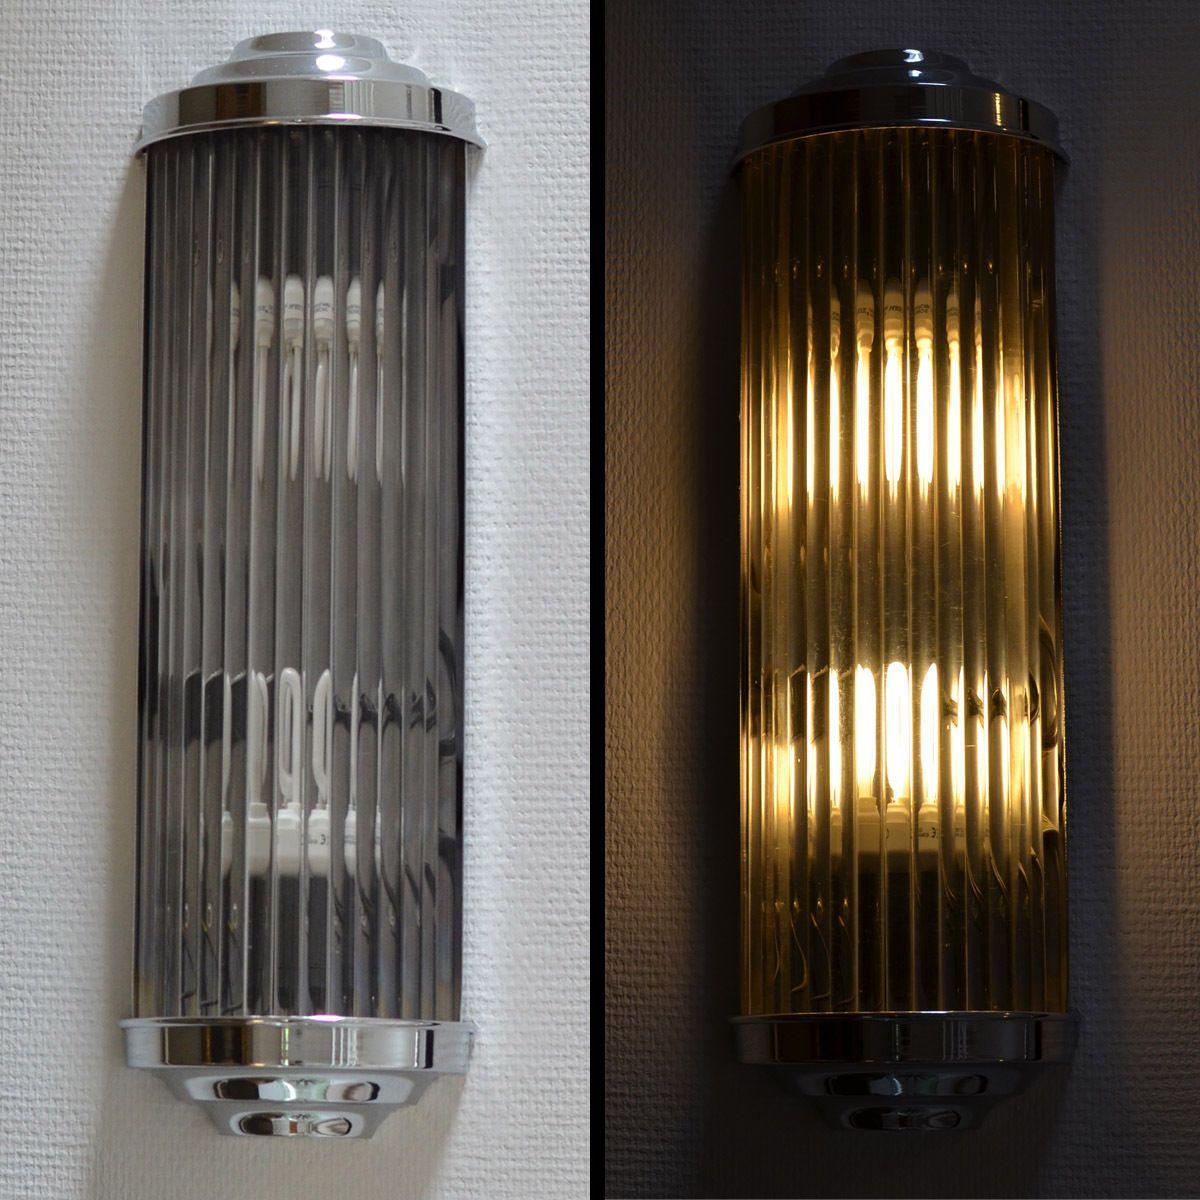 BAUHAUS WALL LIGHT CINEMA STYLE ART DÉCO CHROME LAMP ...